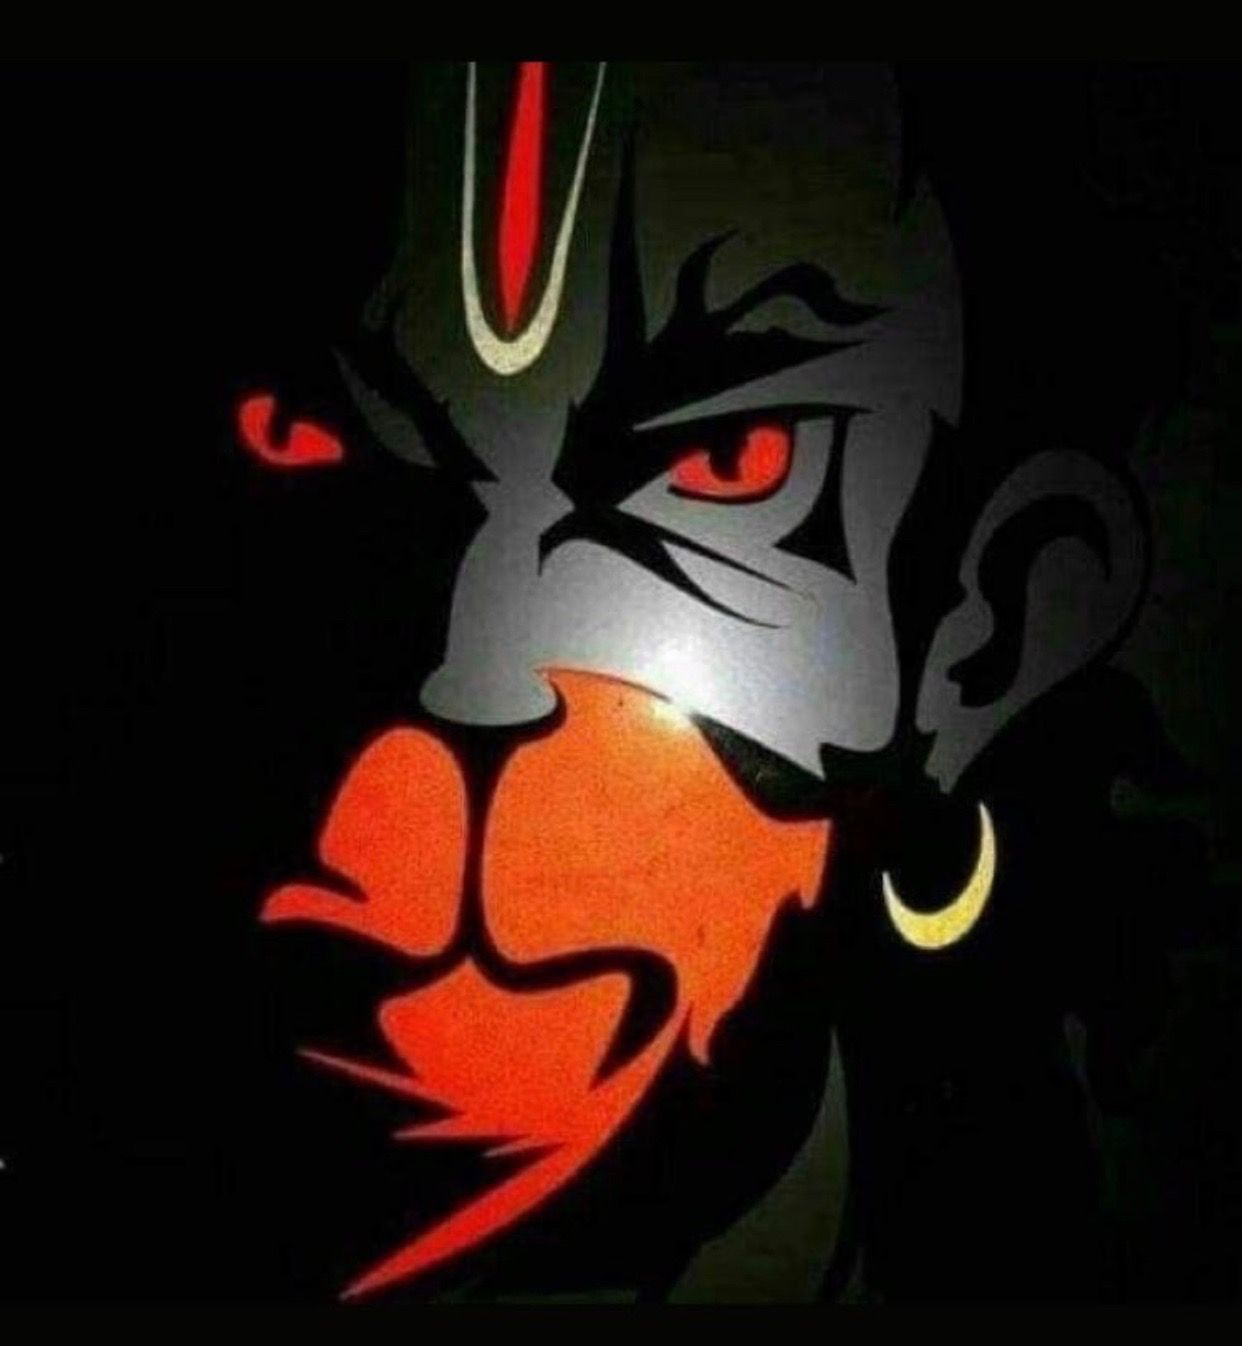 Jai Hanuman Hanuman Ji Wallpapers Hanuman Wallpaper Lord Hanuman Wallpapers Jai hanuman wallpaper hanuman images hd